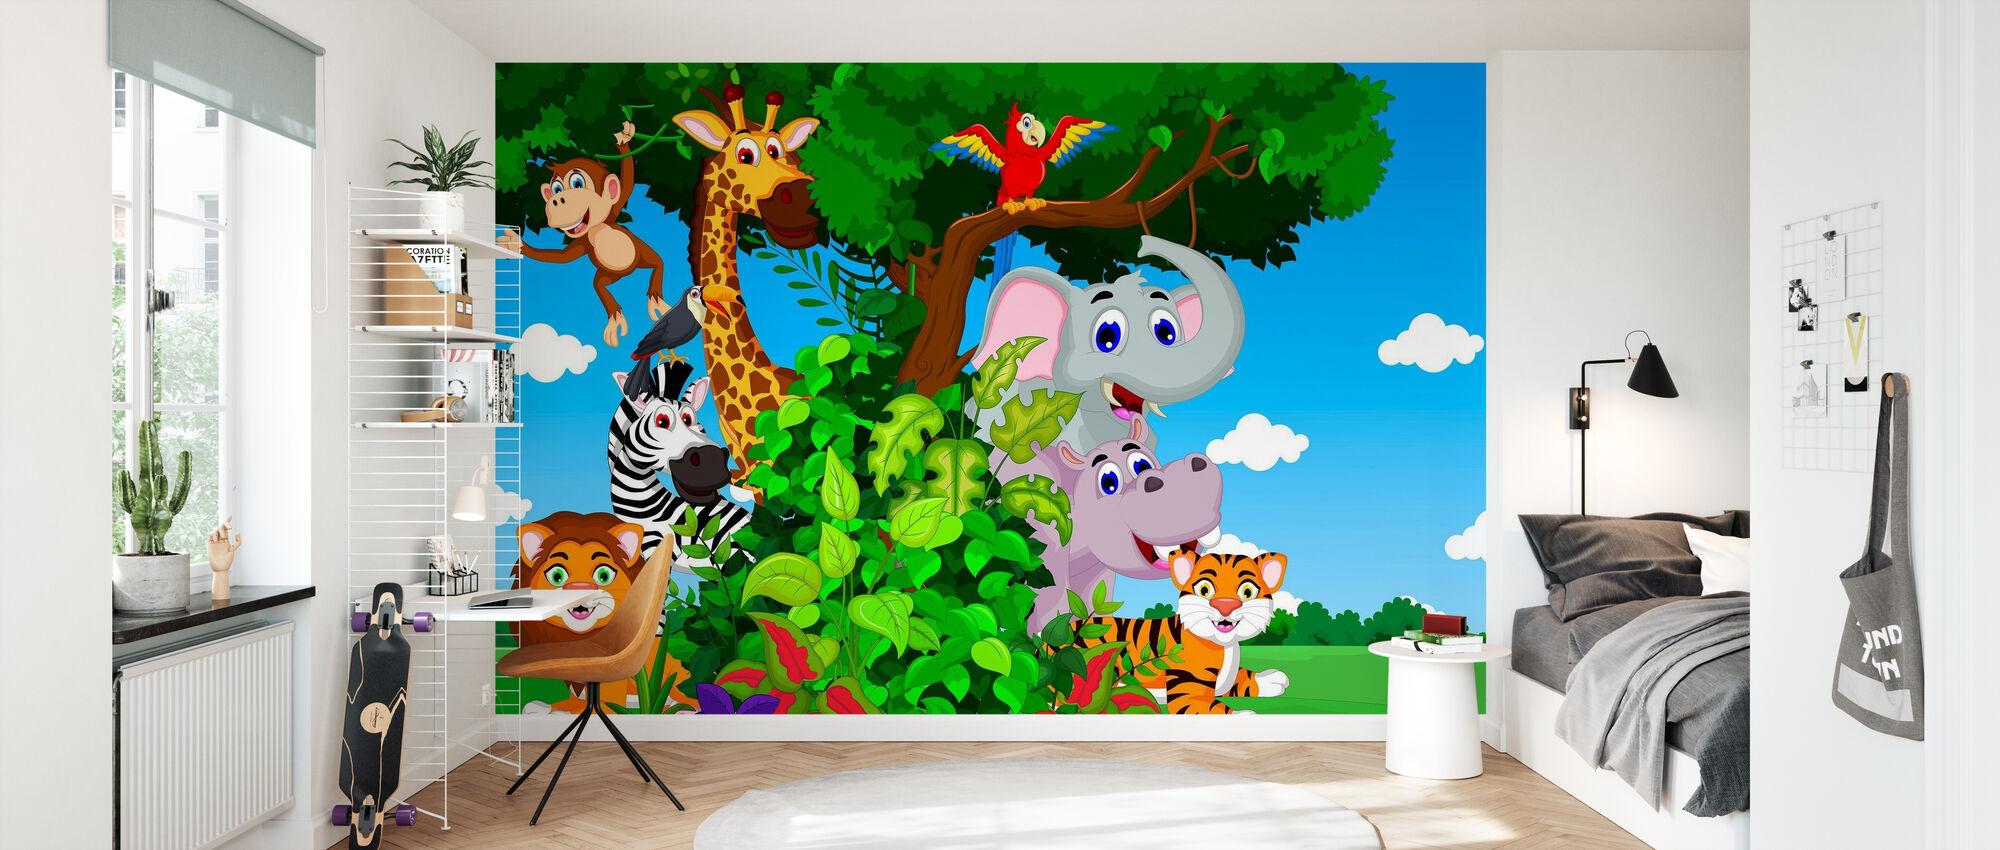 Animals in Forest Cartoon - Wallpaper - Kids Room